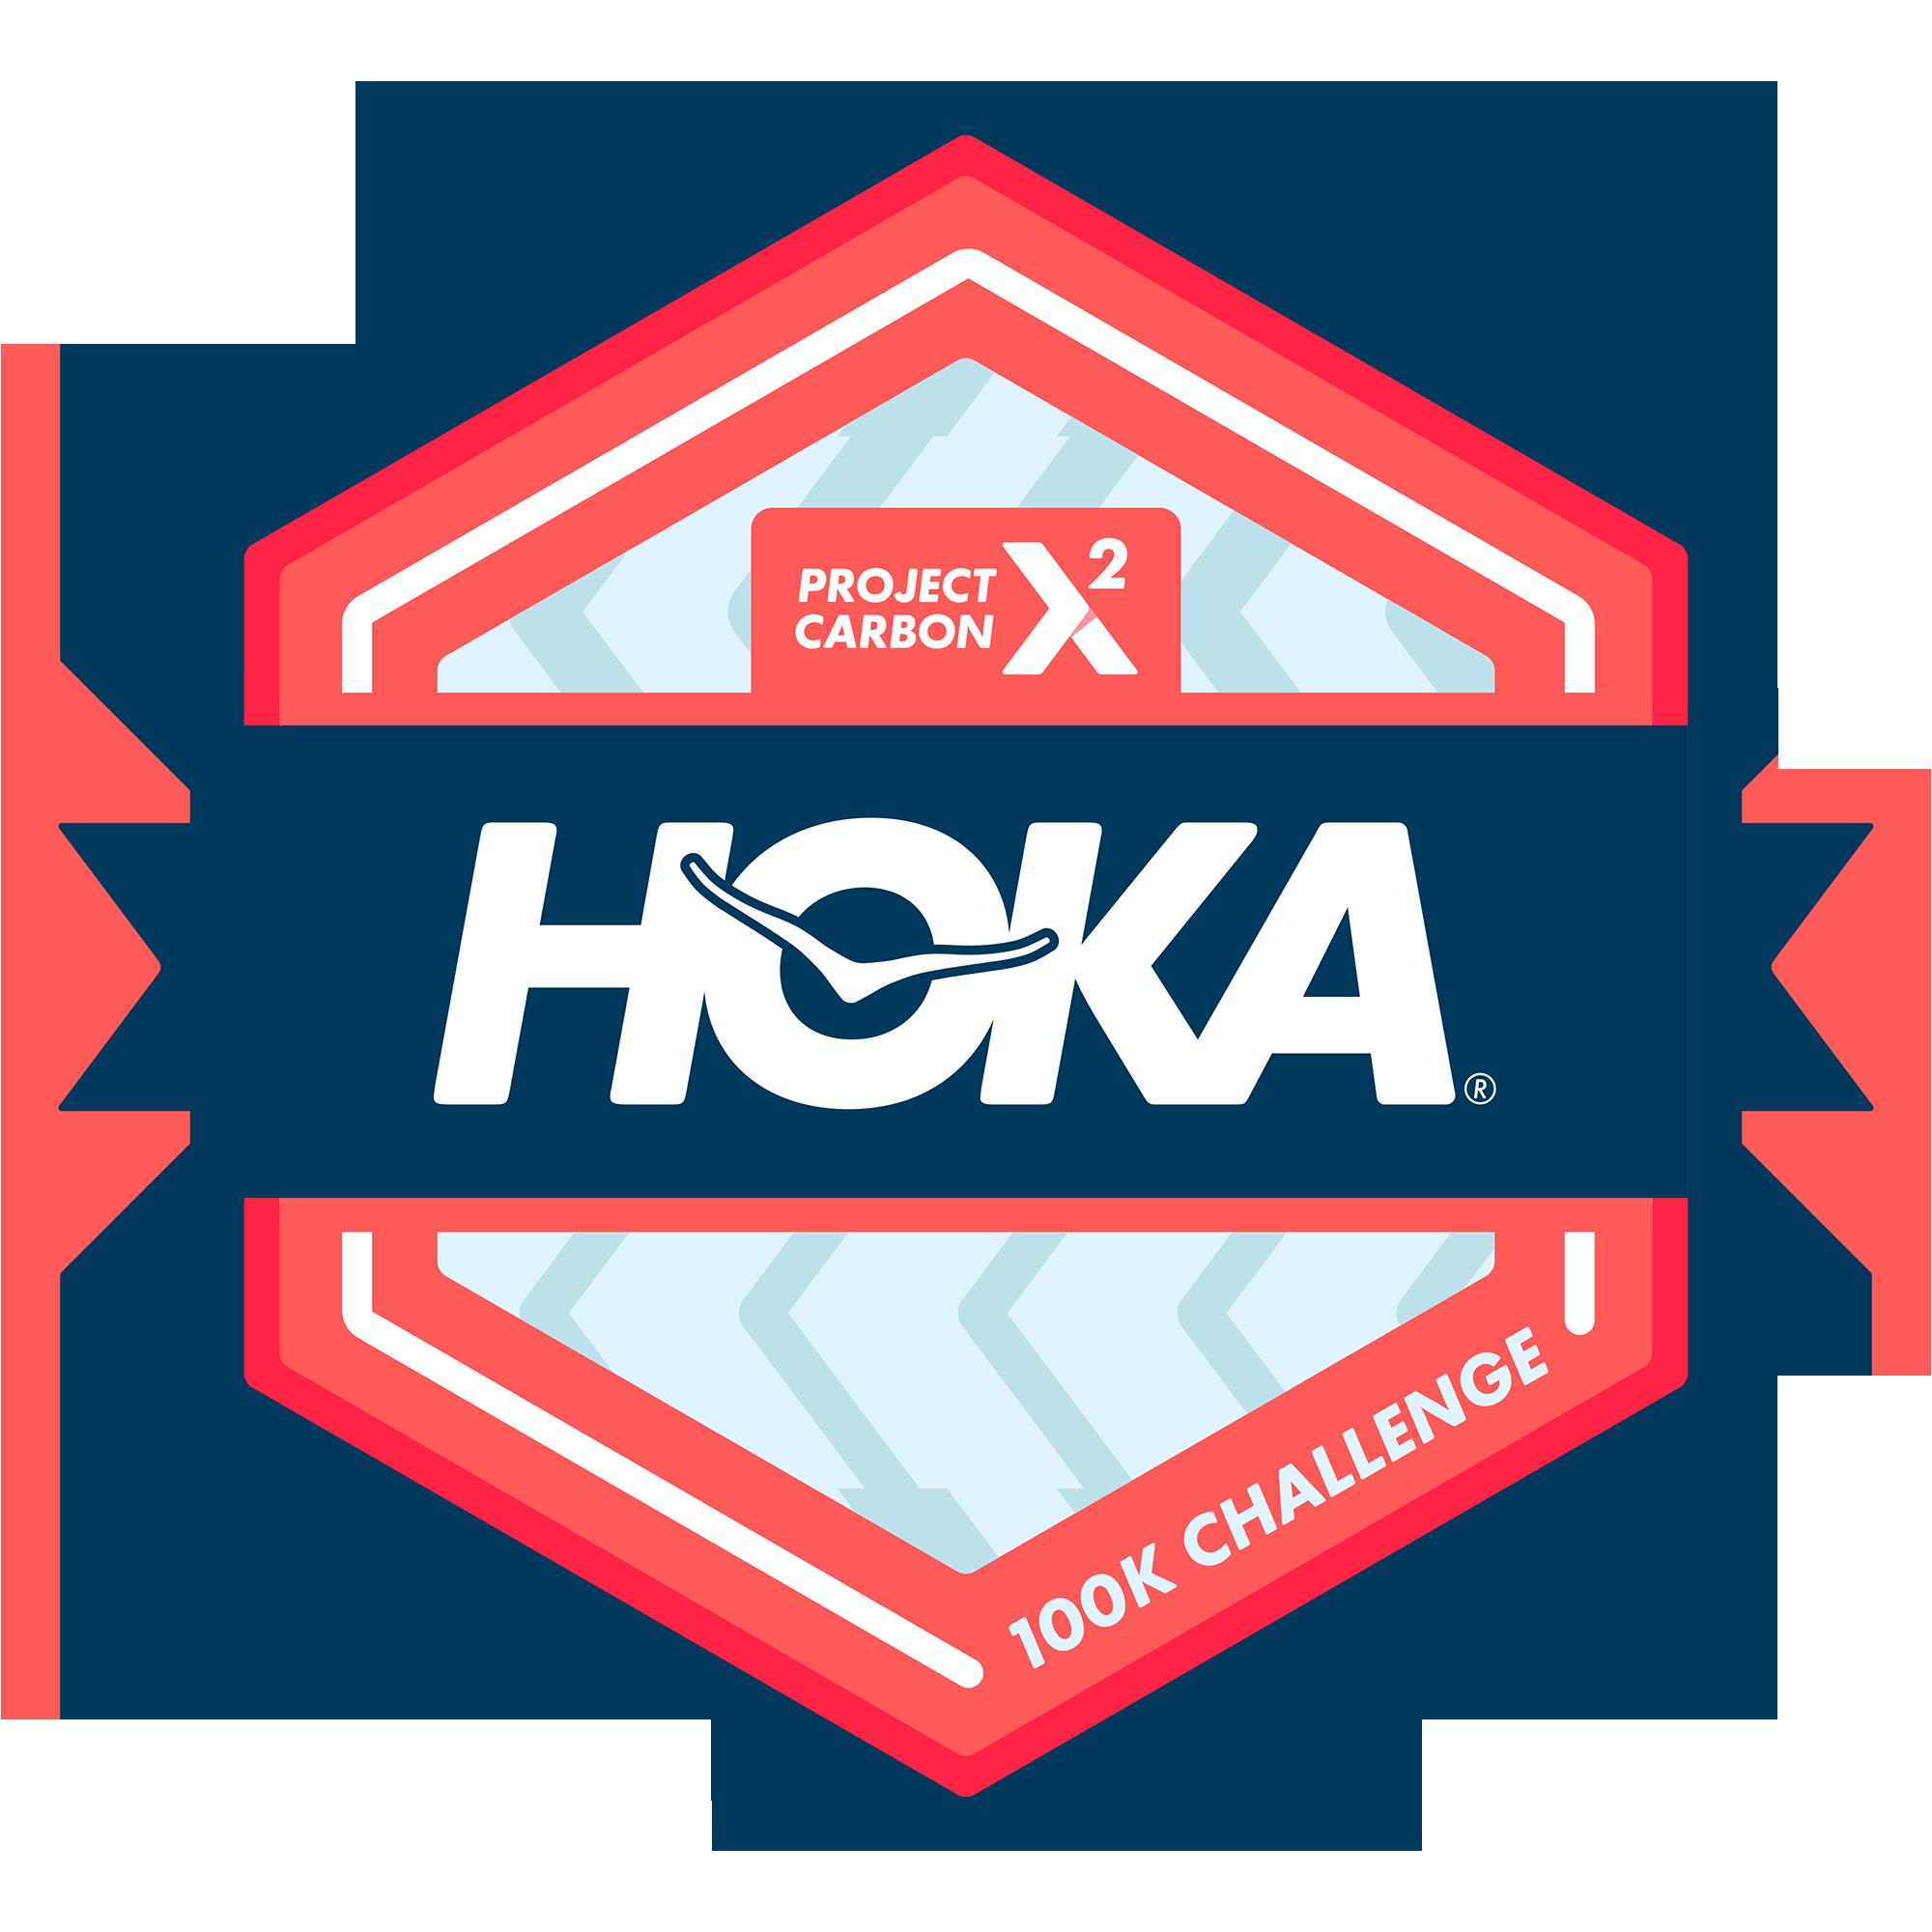 HOKA® Project Carbon X 2 100K Challenge logo